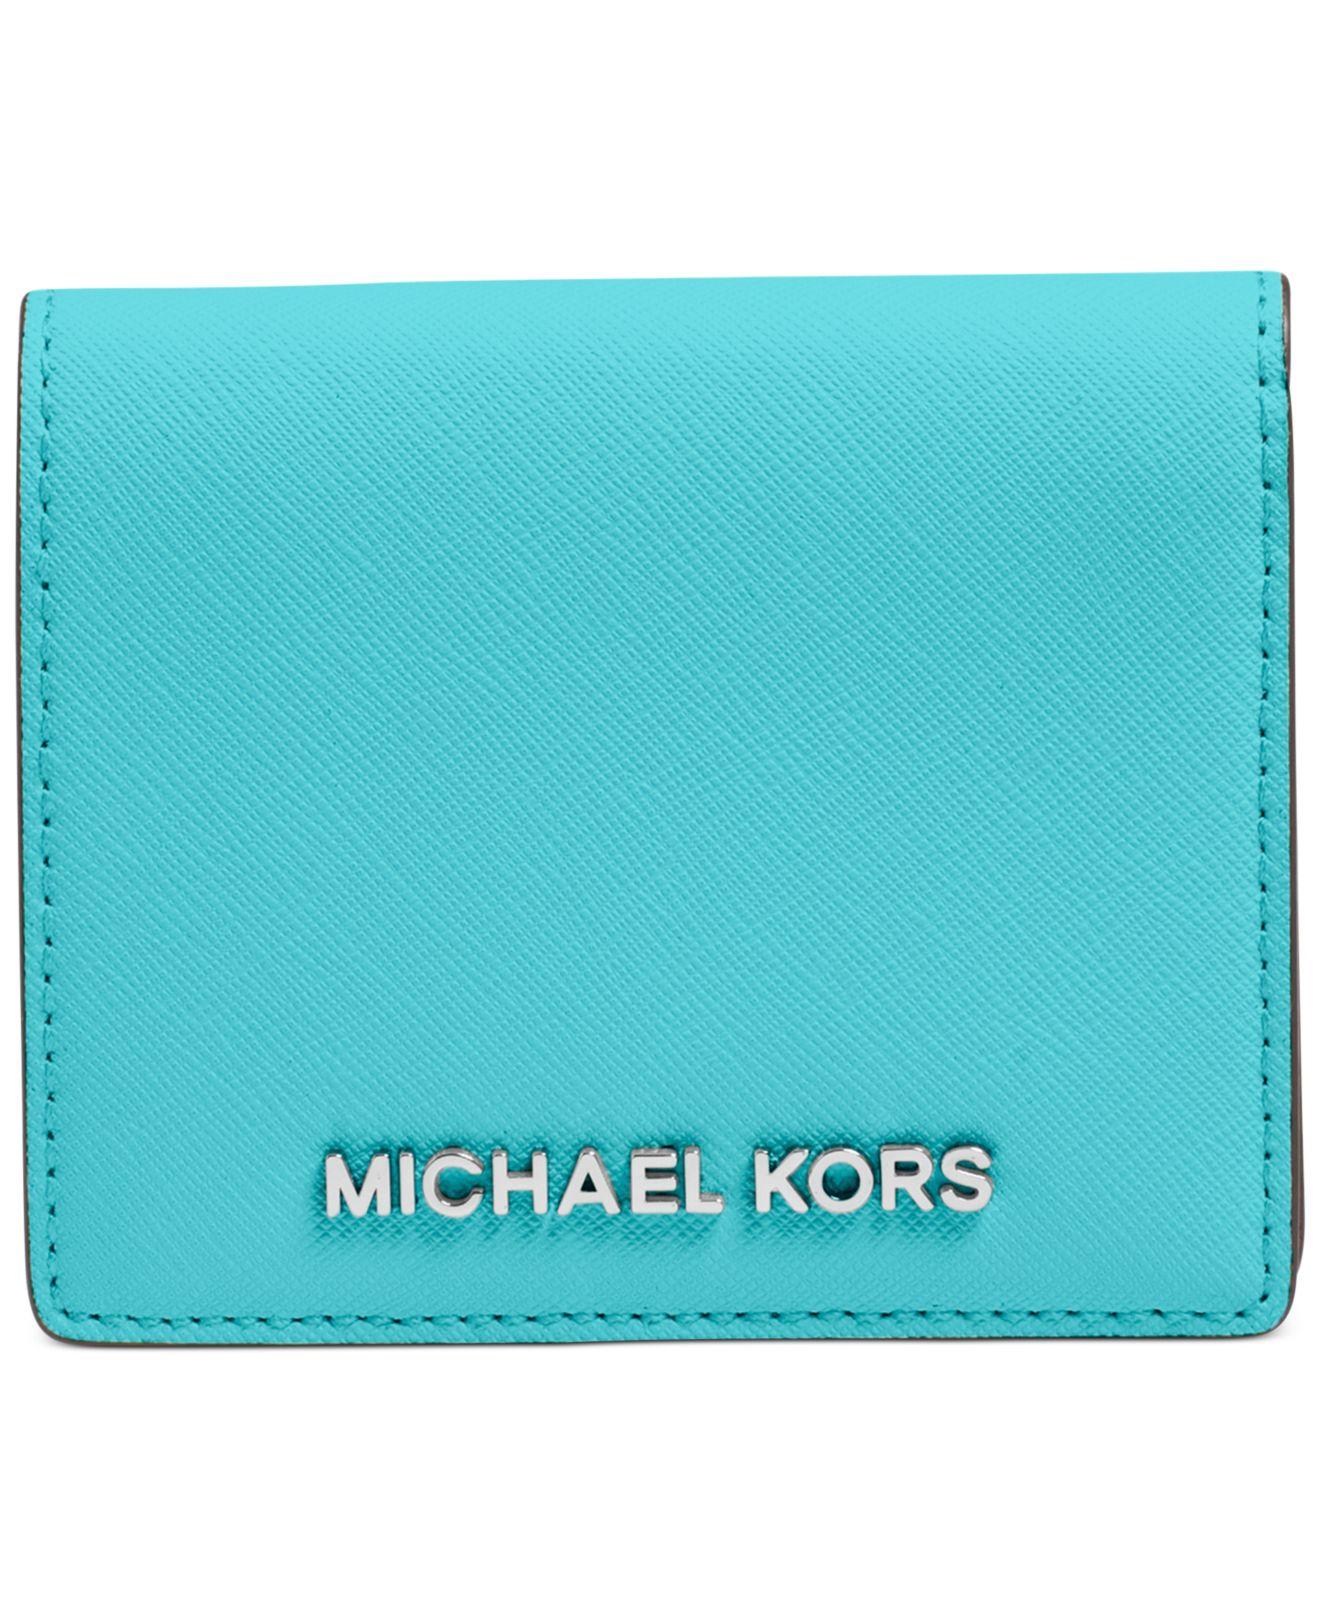 075f52bf5258 Lyst - Michael Kors Michael Jet Set Travel Flap Card Holder in Green